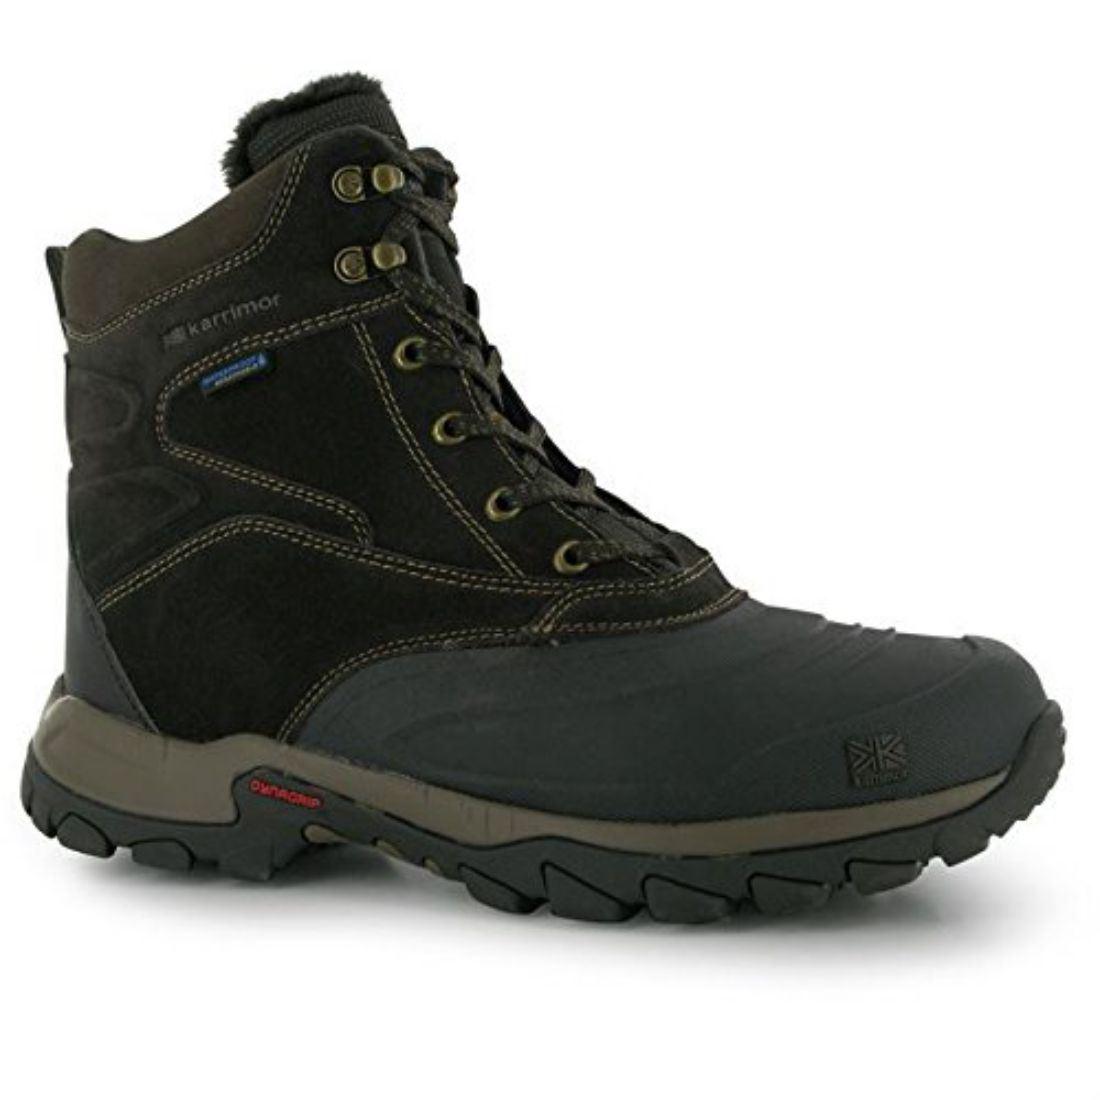 karrimor mens calgary snow boots winter shoes waterproof